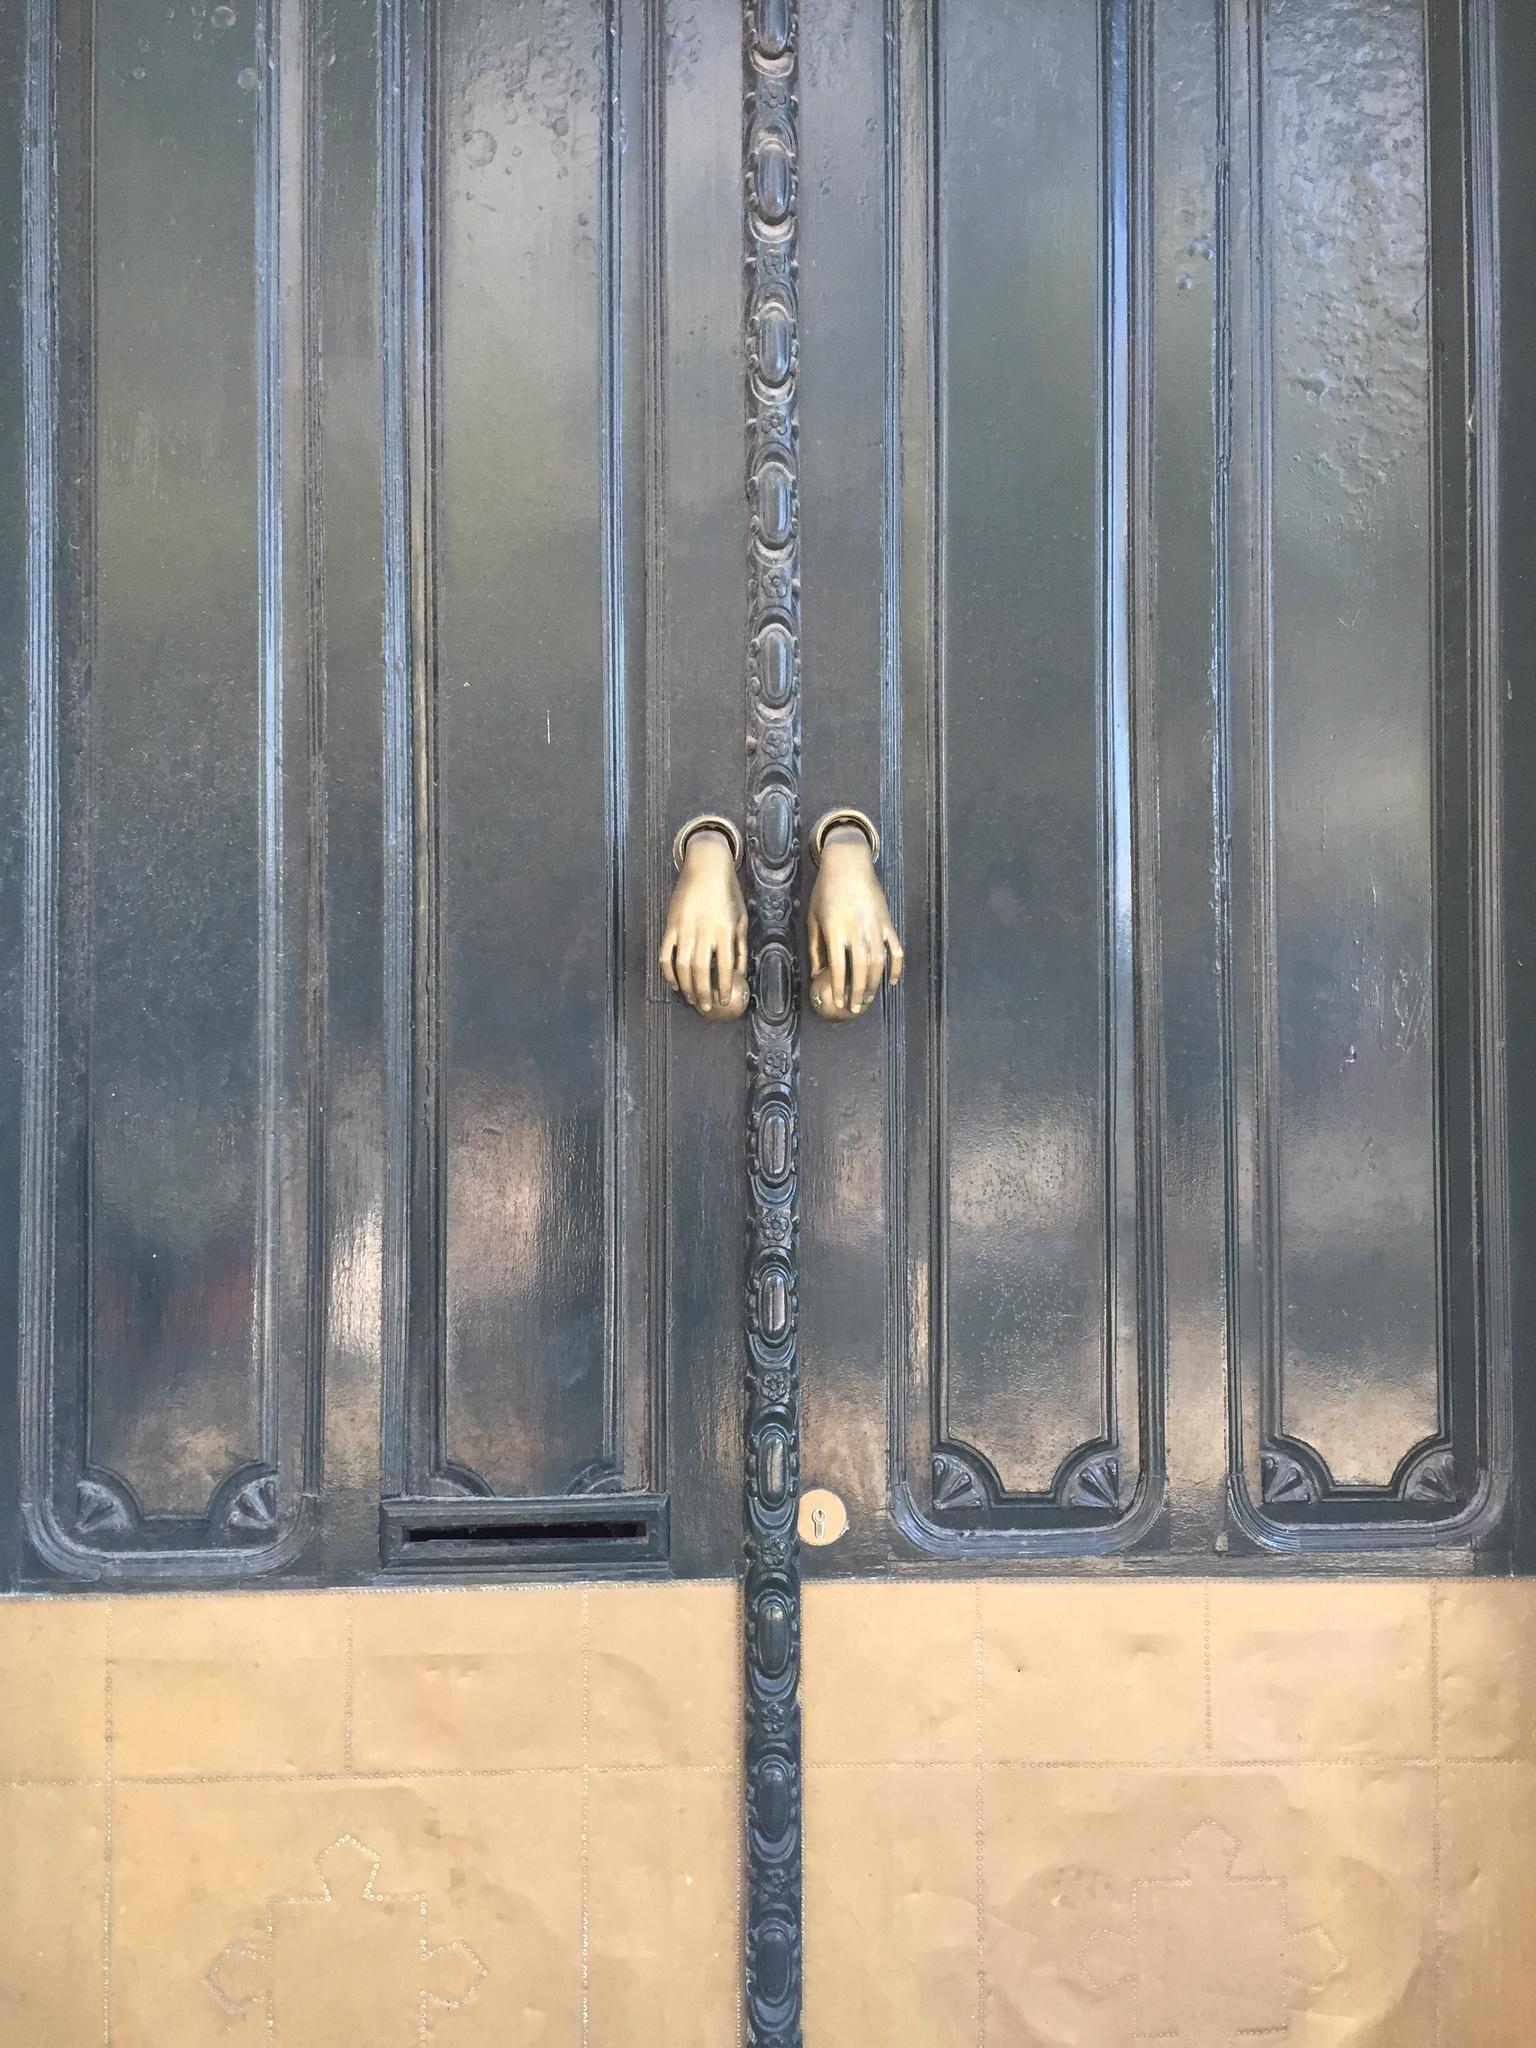 A beautiful door in a beautiful city.